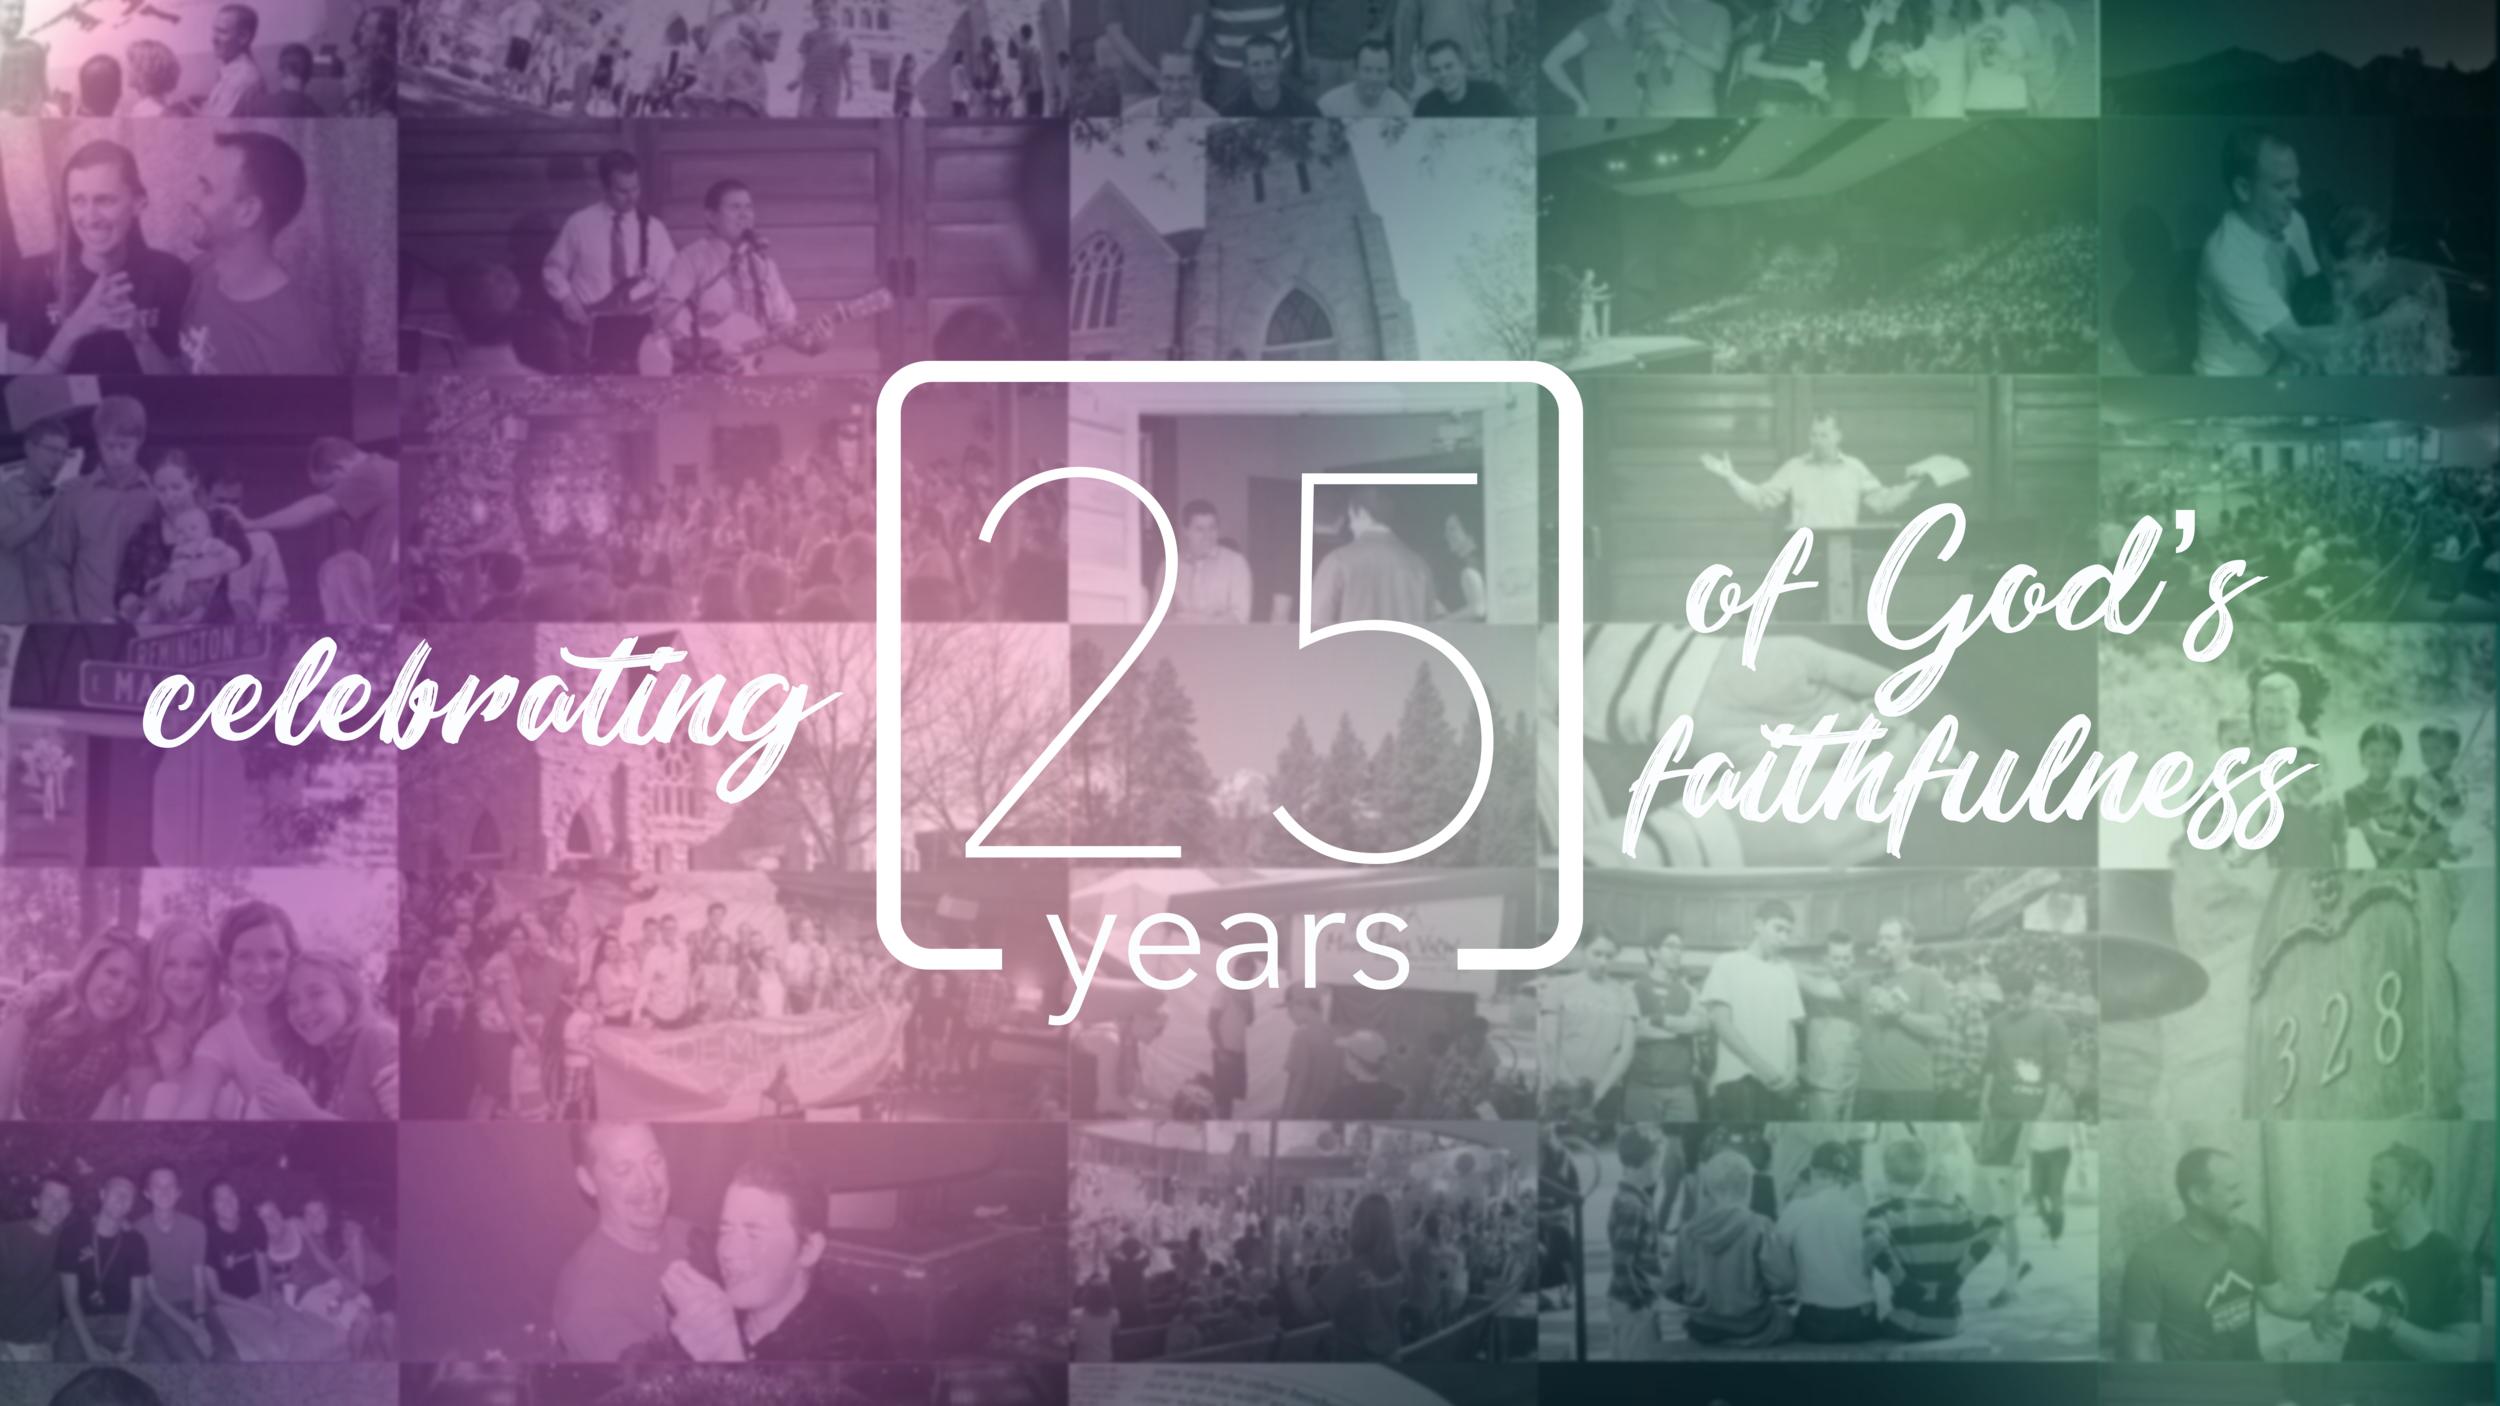 Mountain View Community Church 25th Anniversary